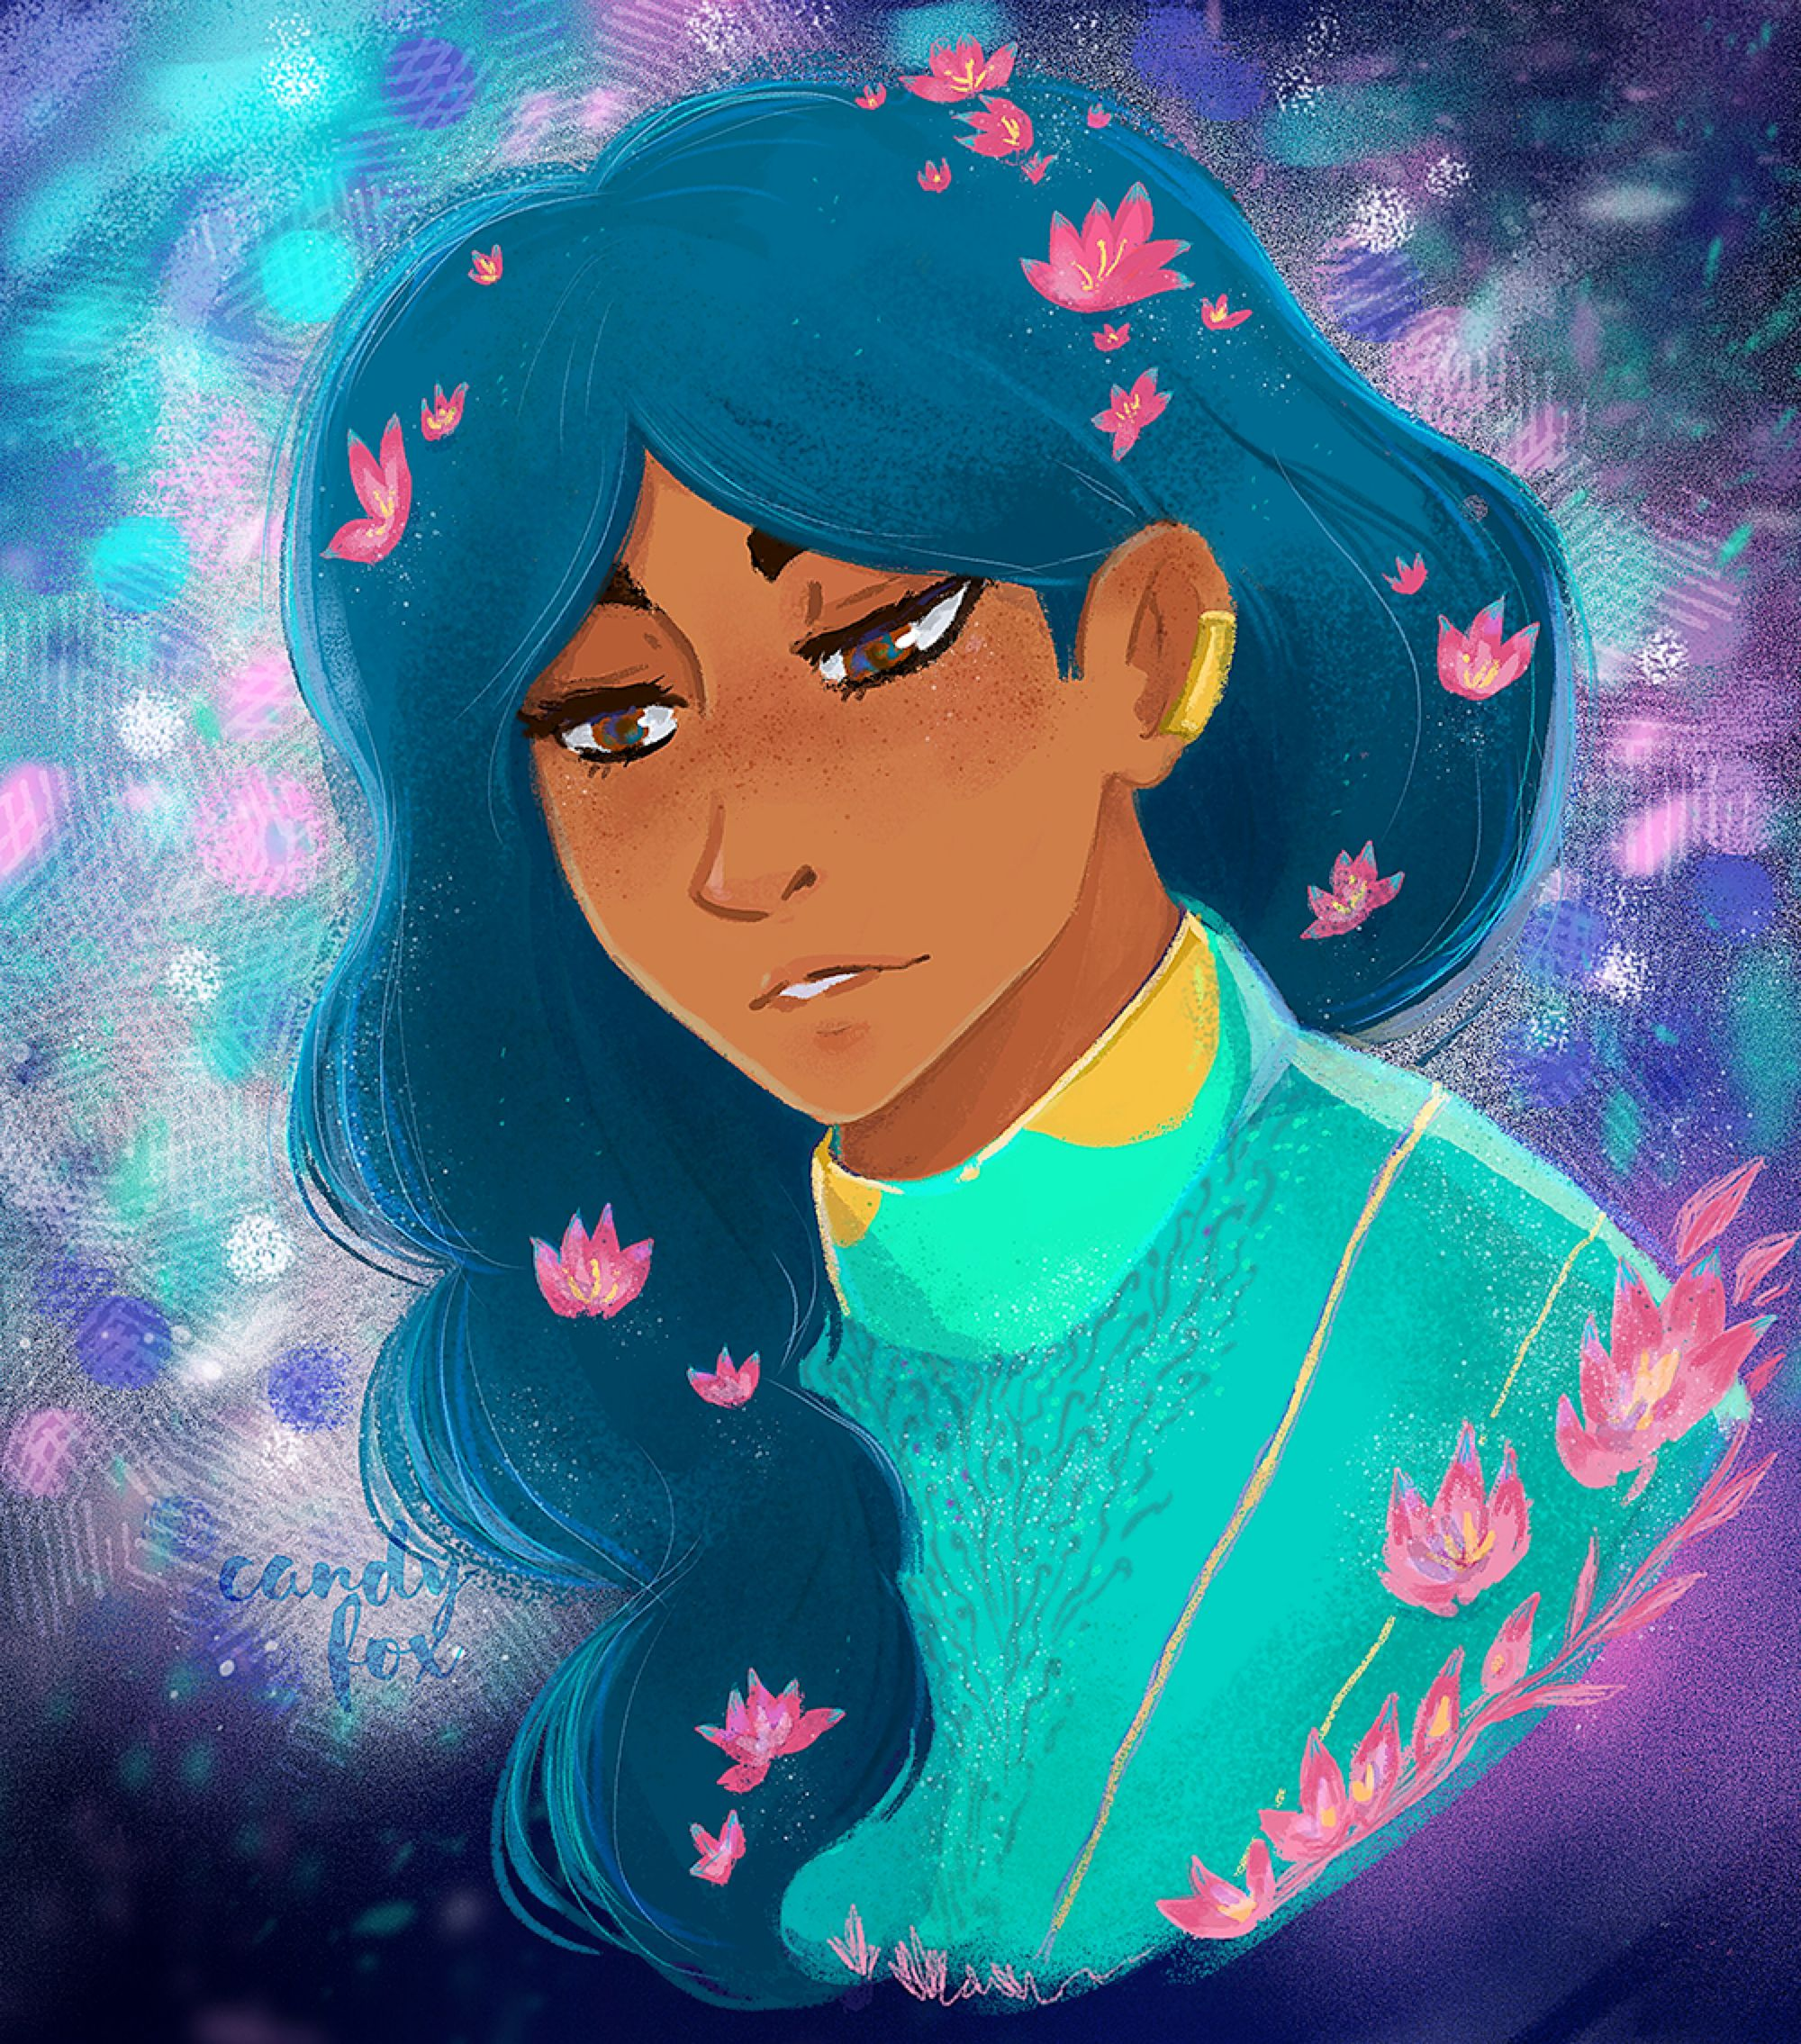 Mermista By Candyfoxdraws On Deviantart She Ra Princess Of Power Princess Of Power Mermista She Ra